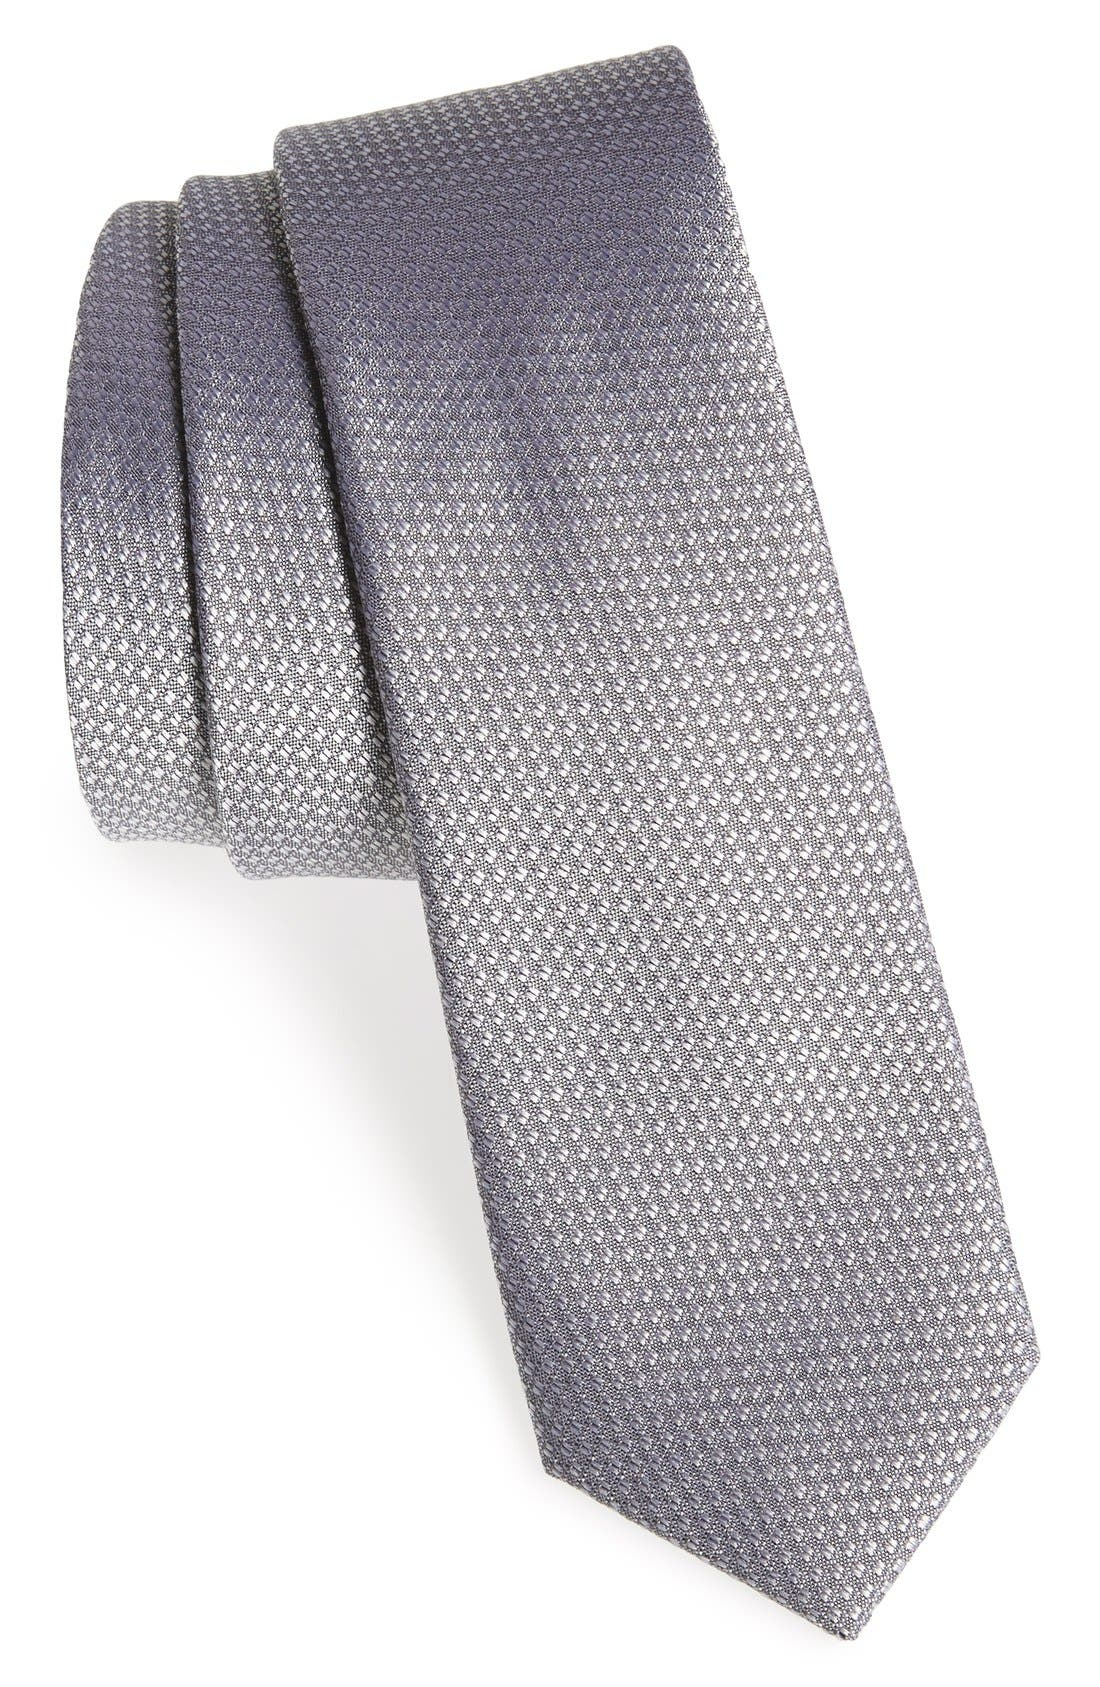 Seattle Textured Silk Tie,                             Main thumbnail 28, color,